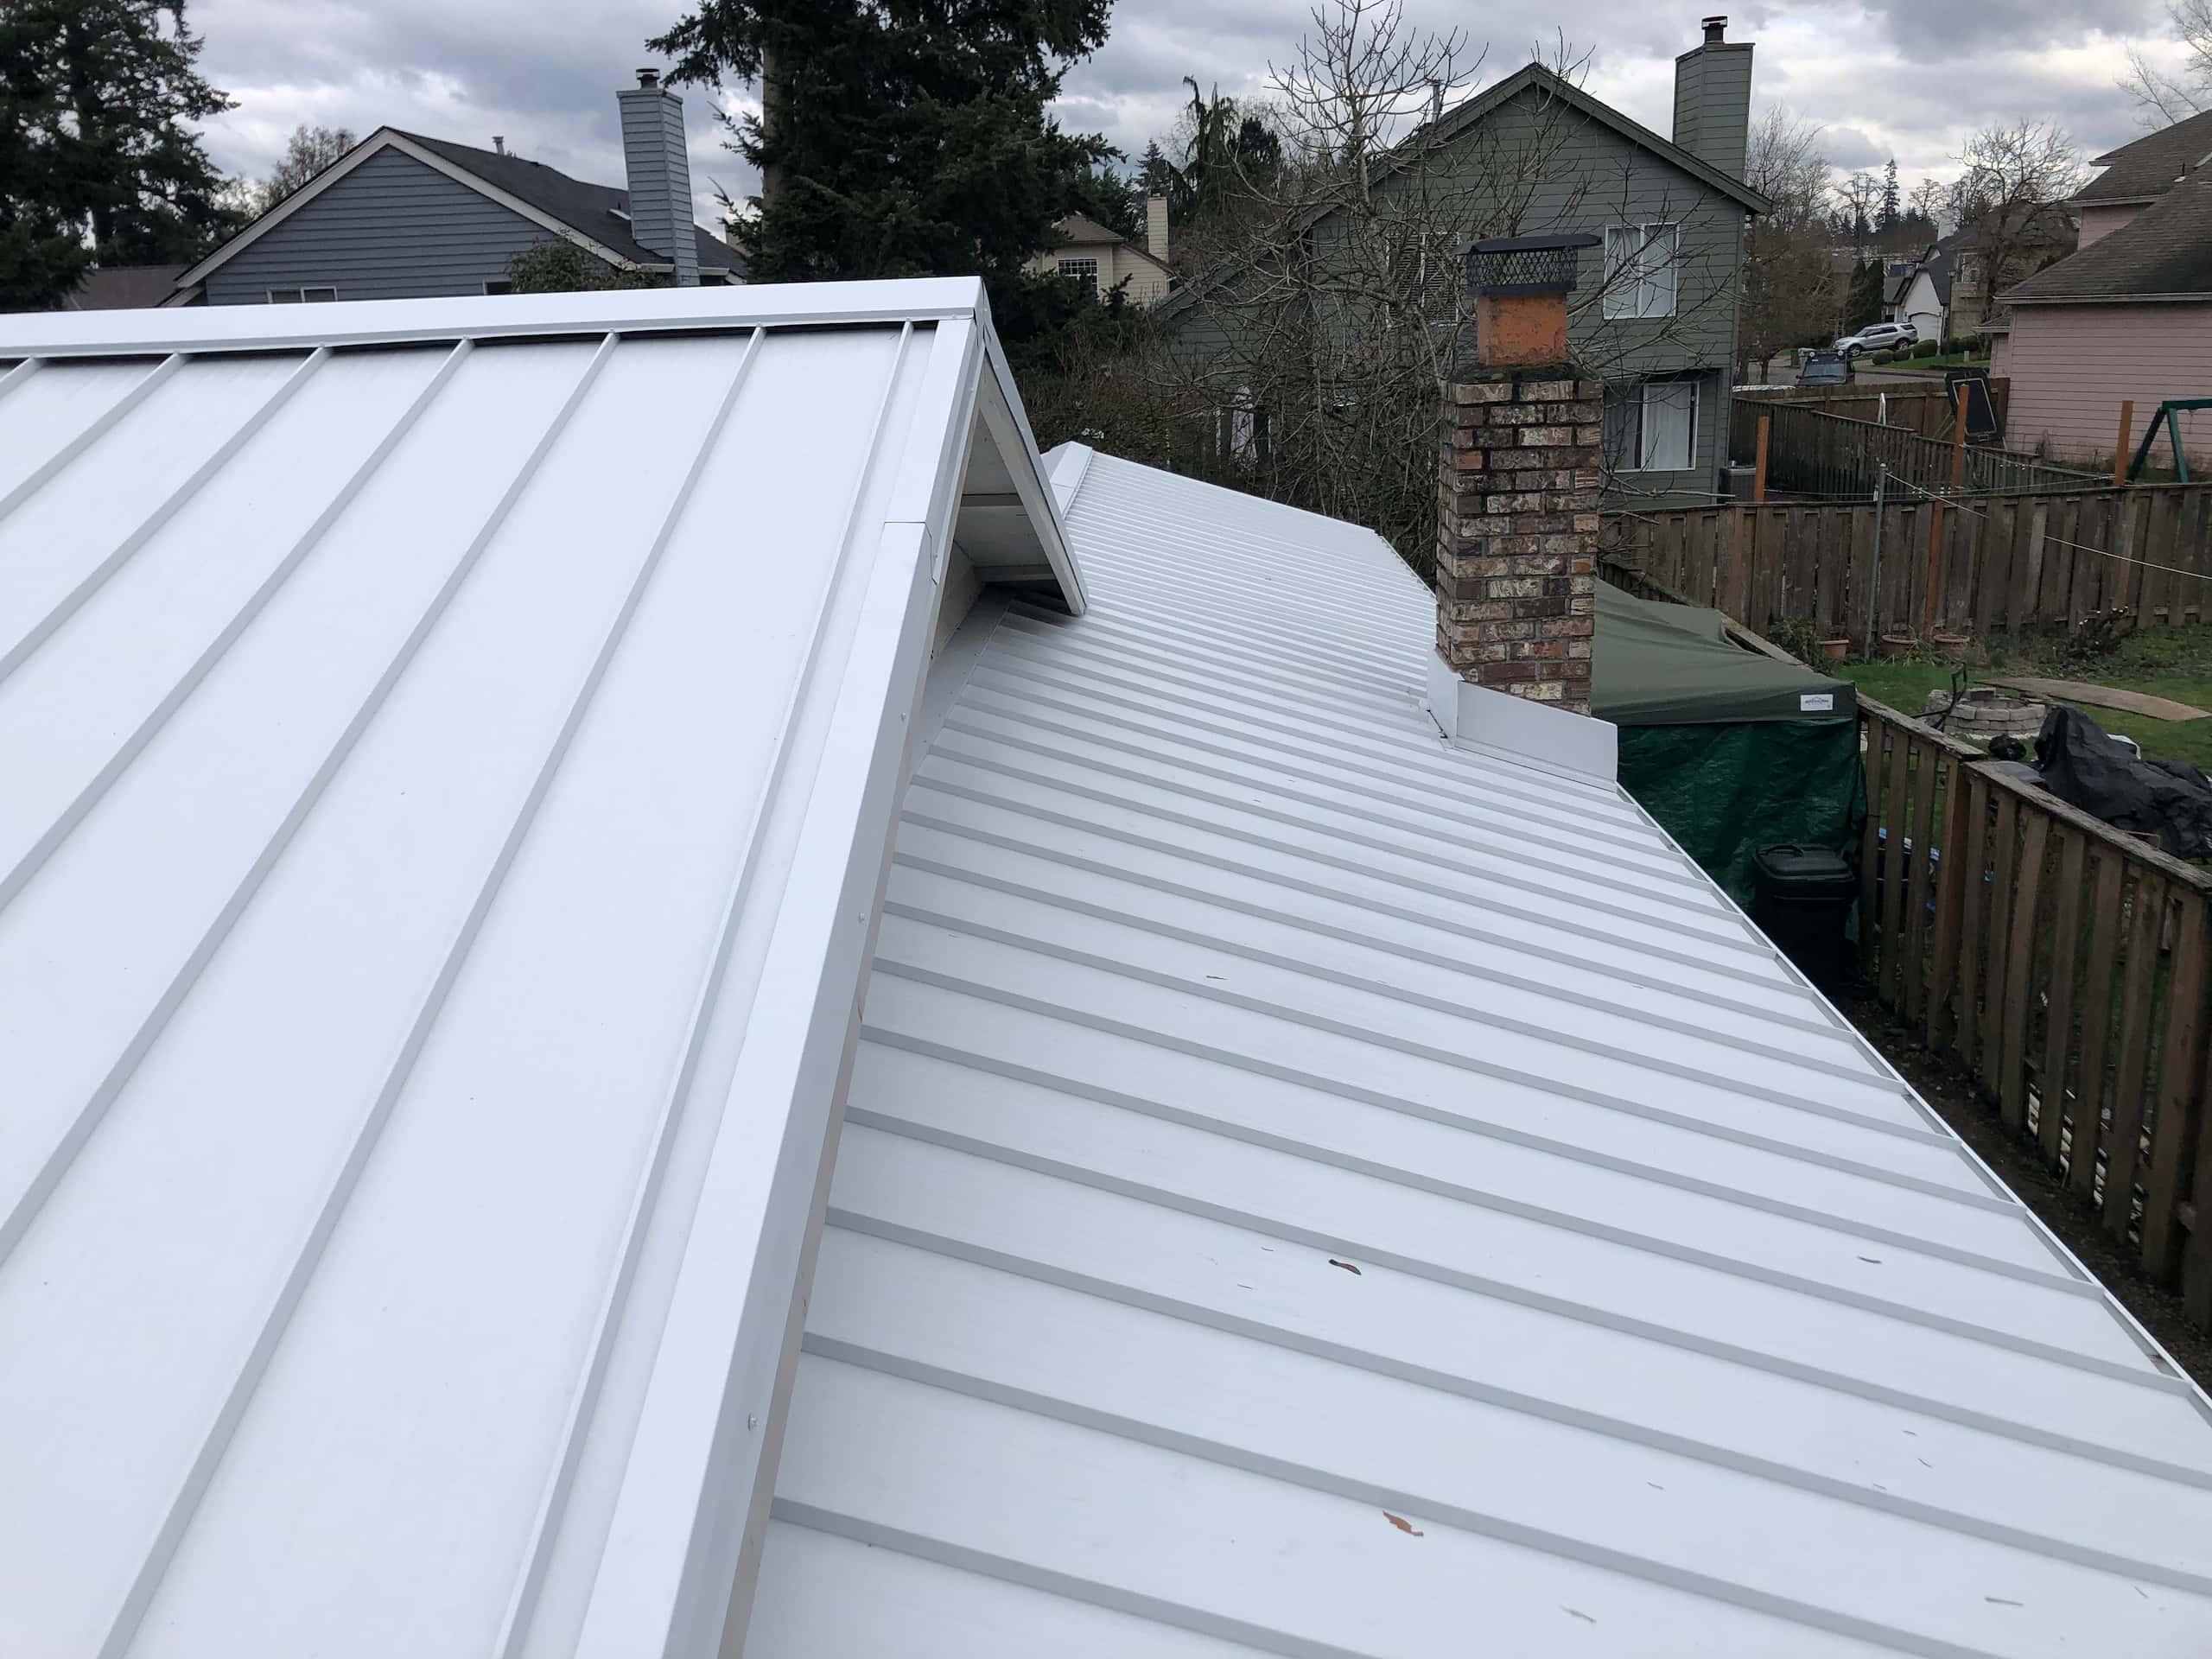 Reliance Roof Pros LLC | Beaverton | New Roof | Taylor Metal 24 Gauge Kynar | Glacier White | Top